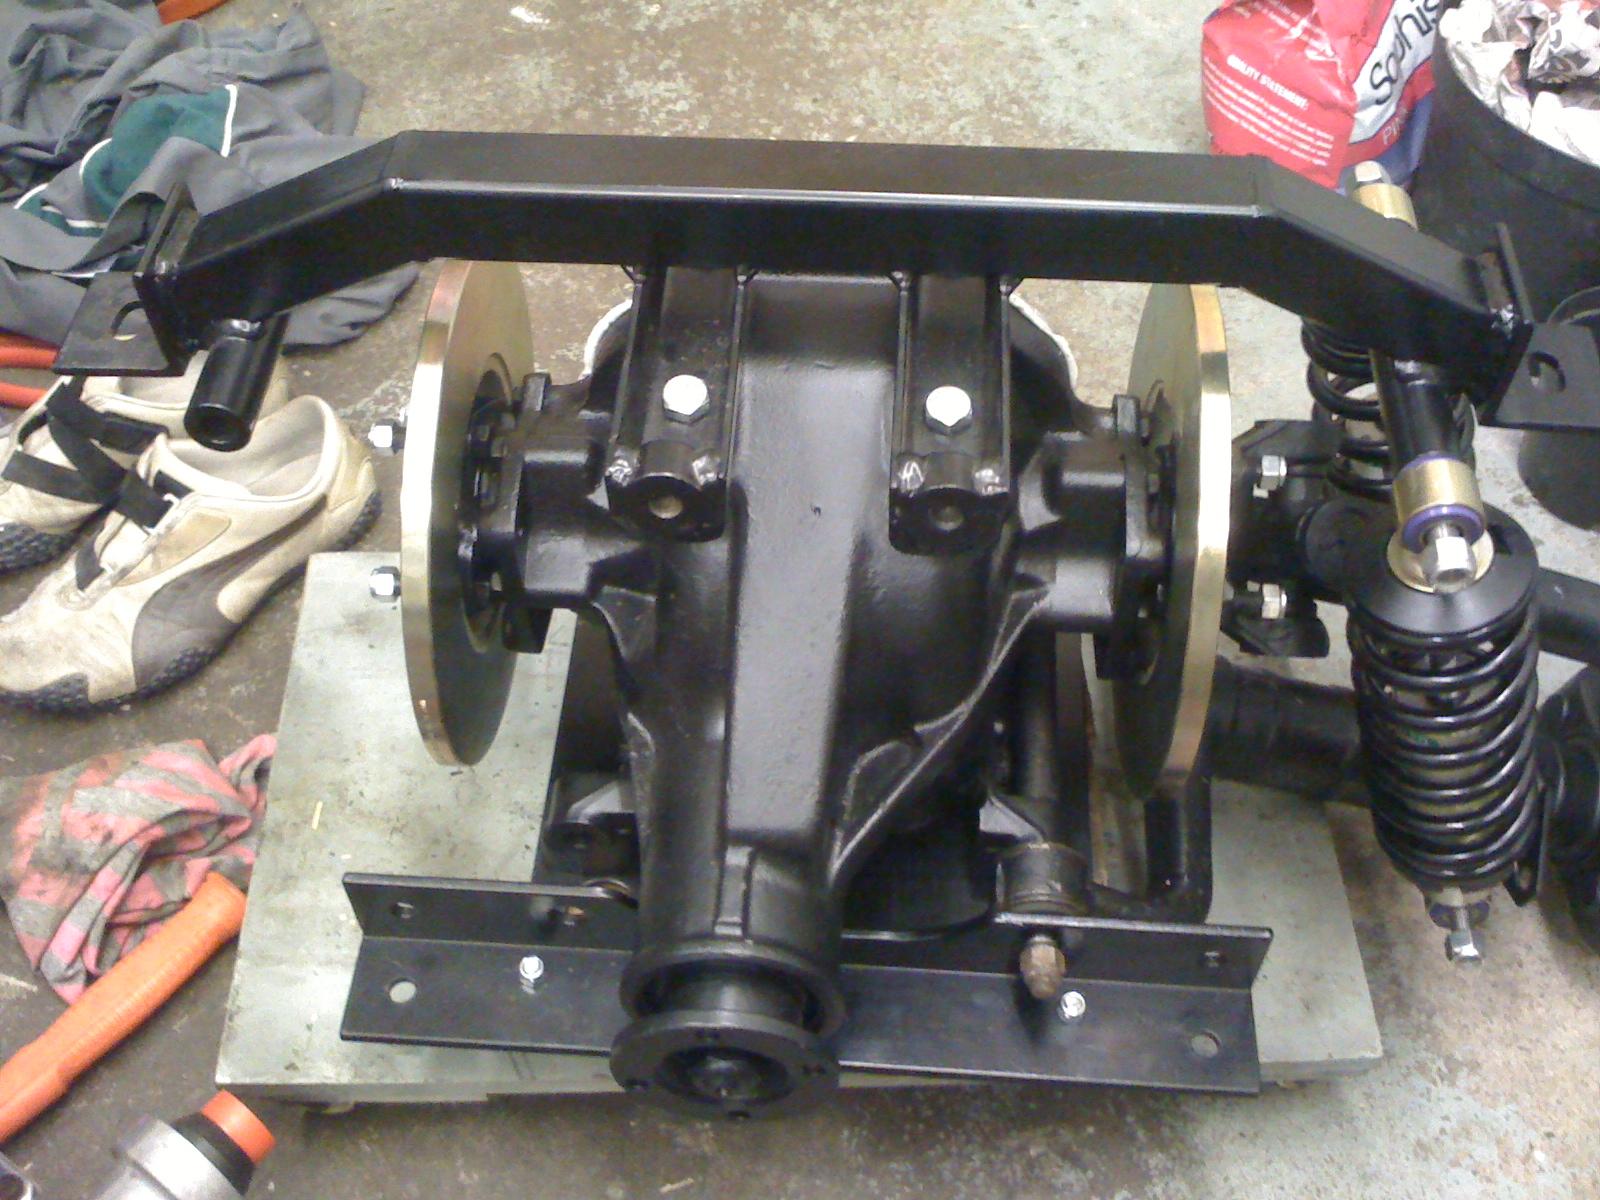 jaguar xj8 fuse box location jaguar xjs fuse box location wiring diagram   odicis Jaguar S Type Fuse Diagram Jaguar X-Type Fuse Box Diagram